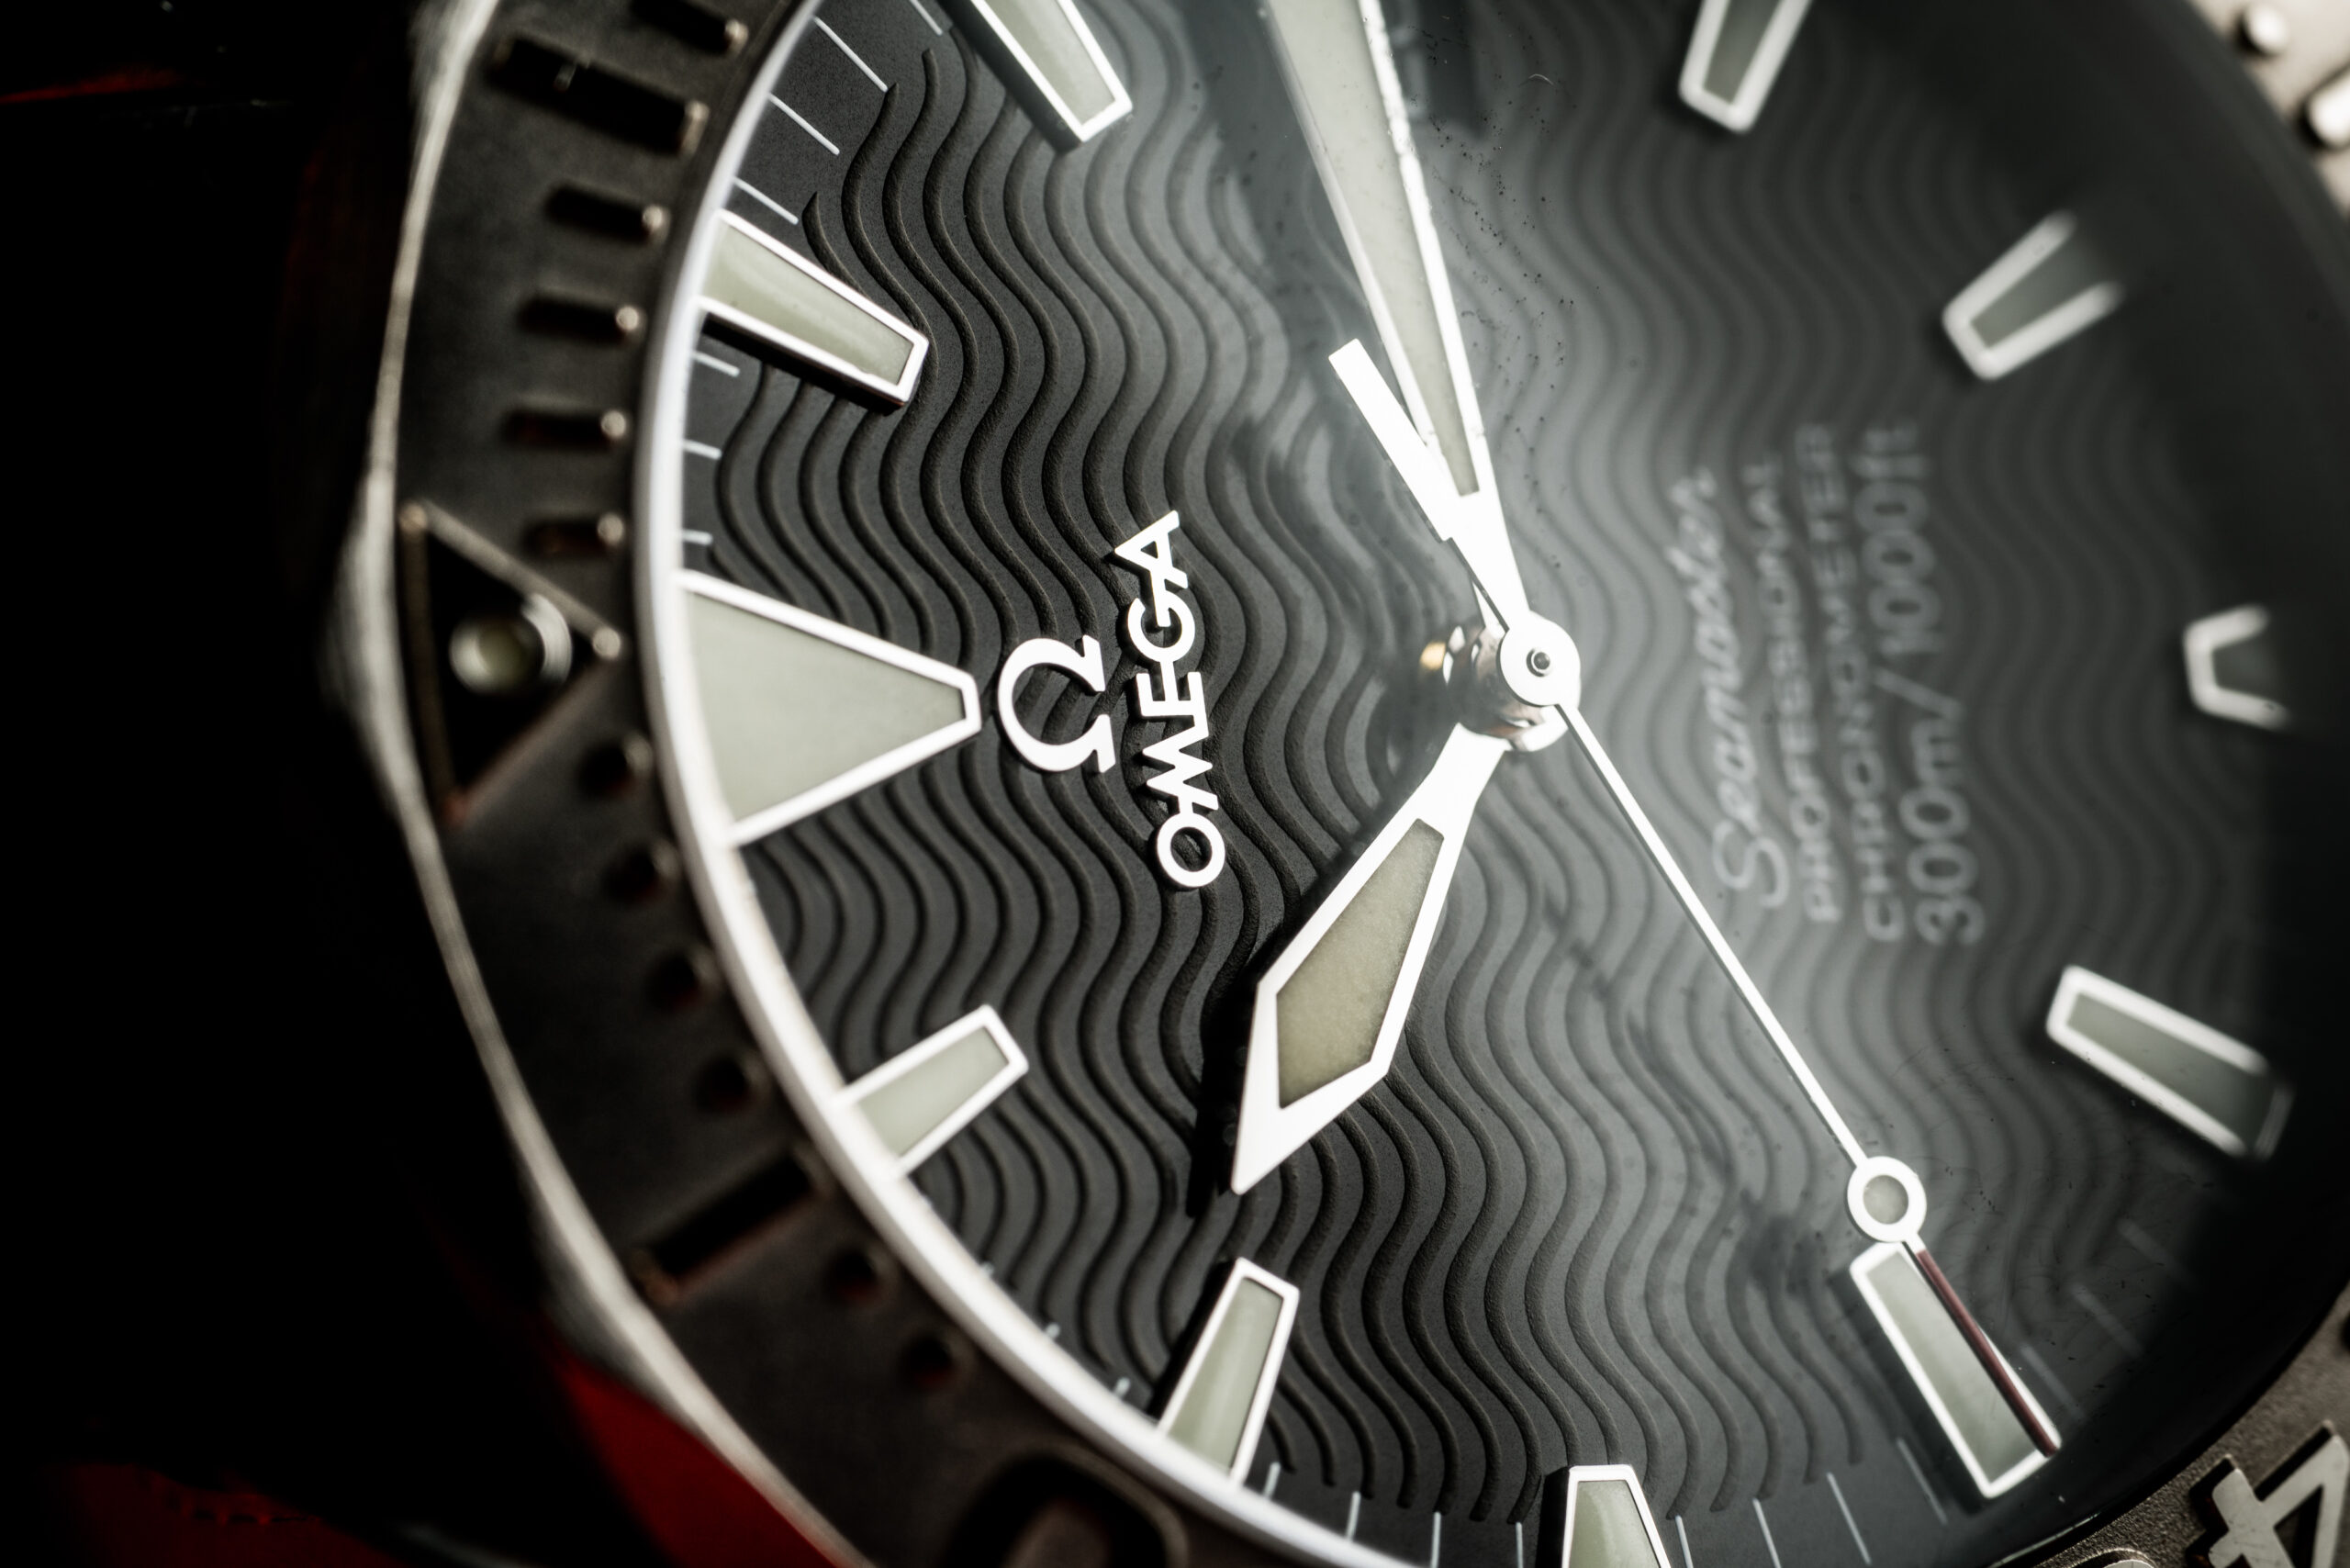 omega seamaster professional 300m 22305000 white gold bezel 2006 dial